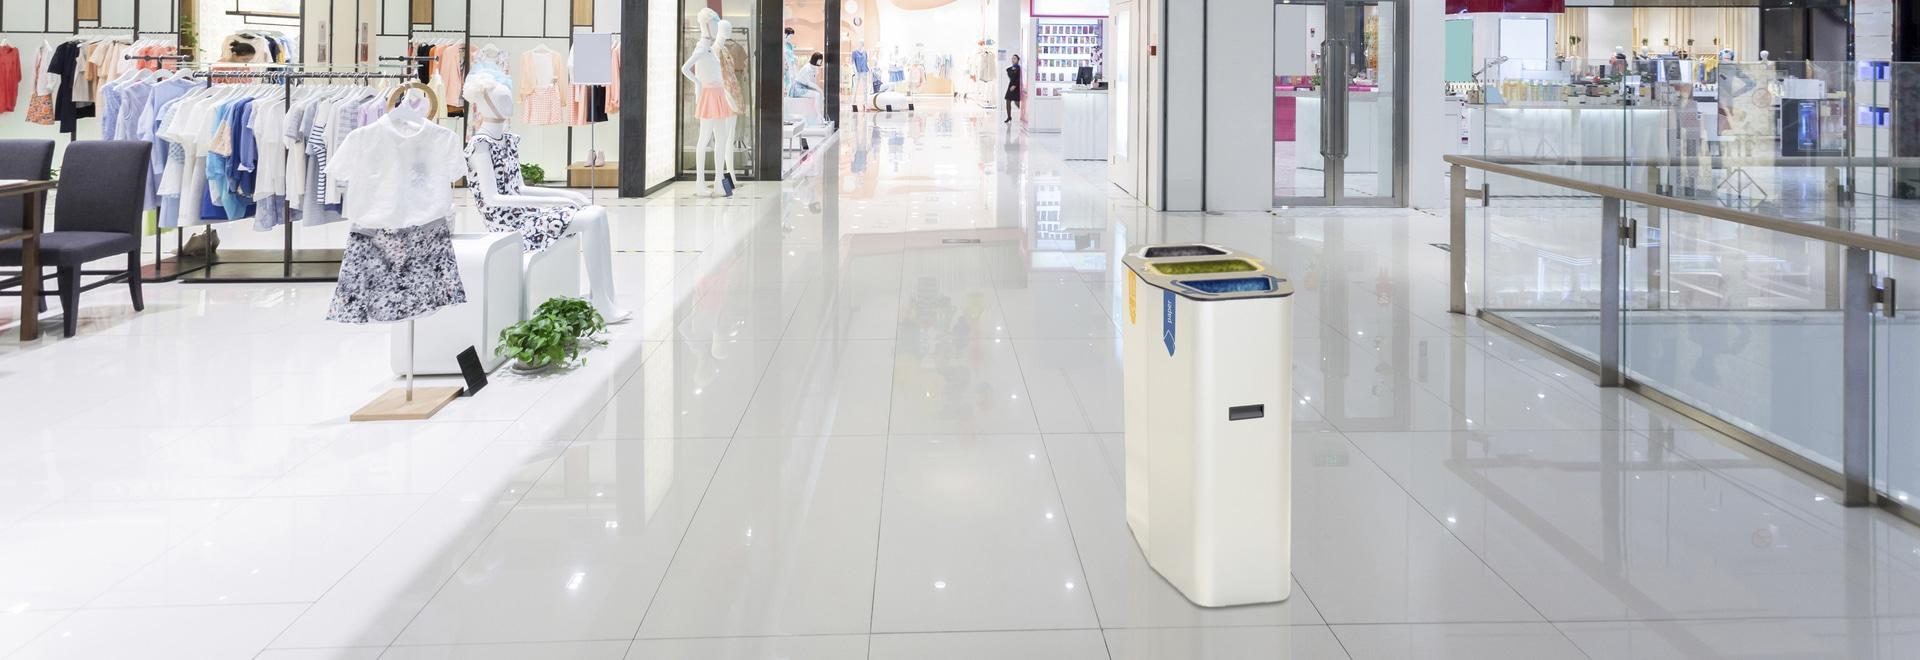 Munich recycling bin - White Edition